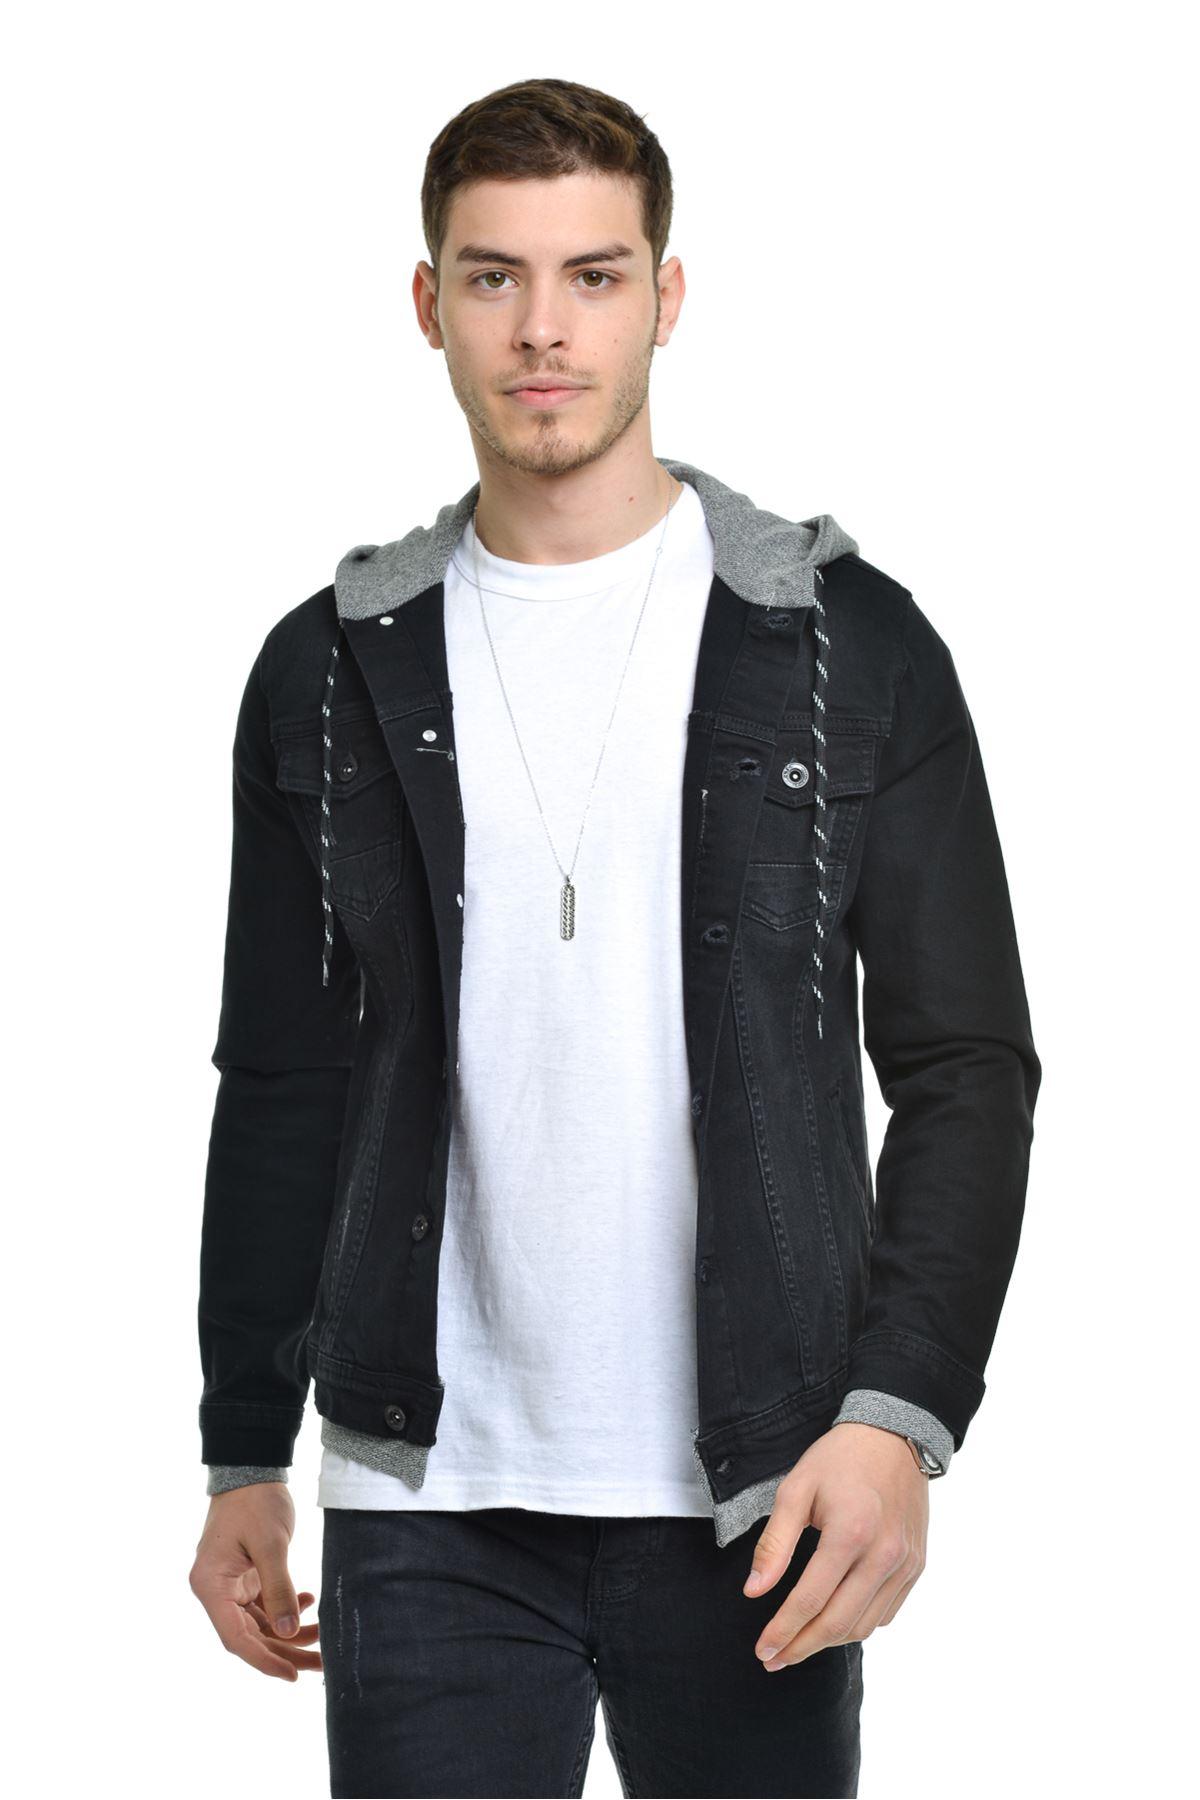 Erkek Kapüşonlu Ribana Detay Yıpratma Siyah Kot Ceket